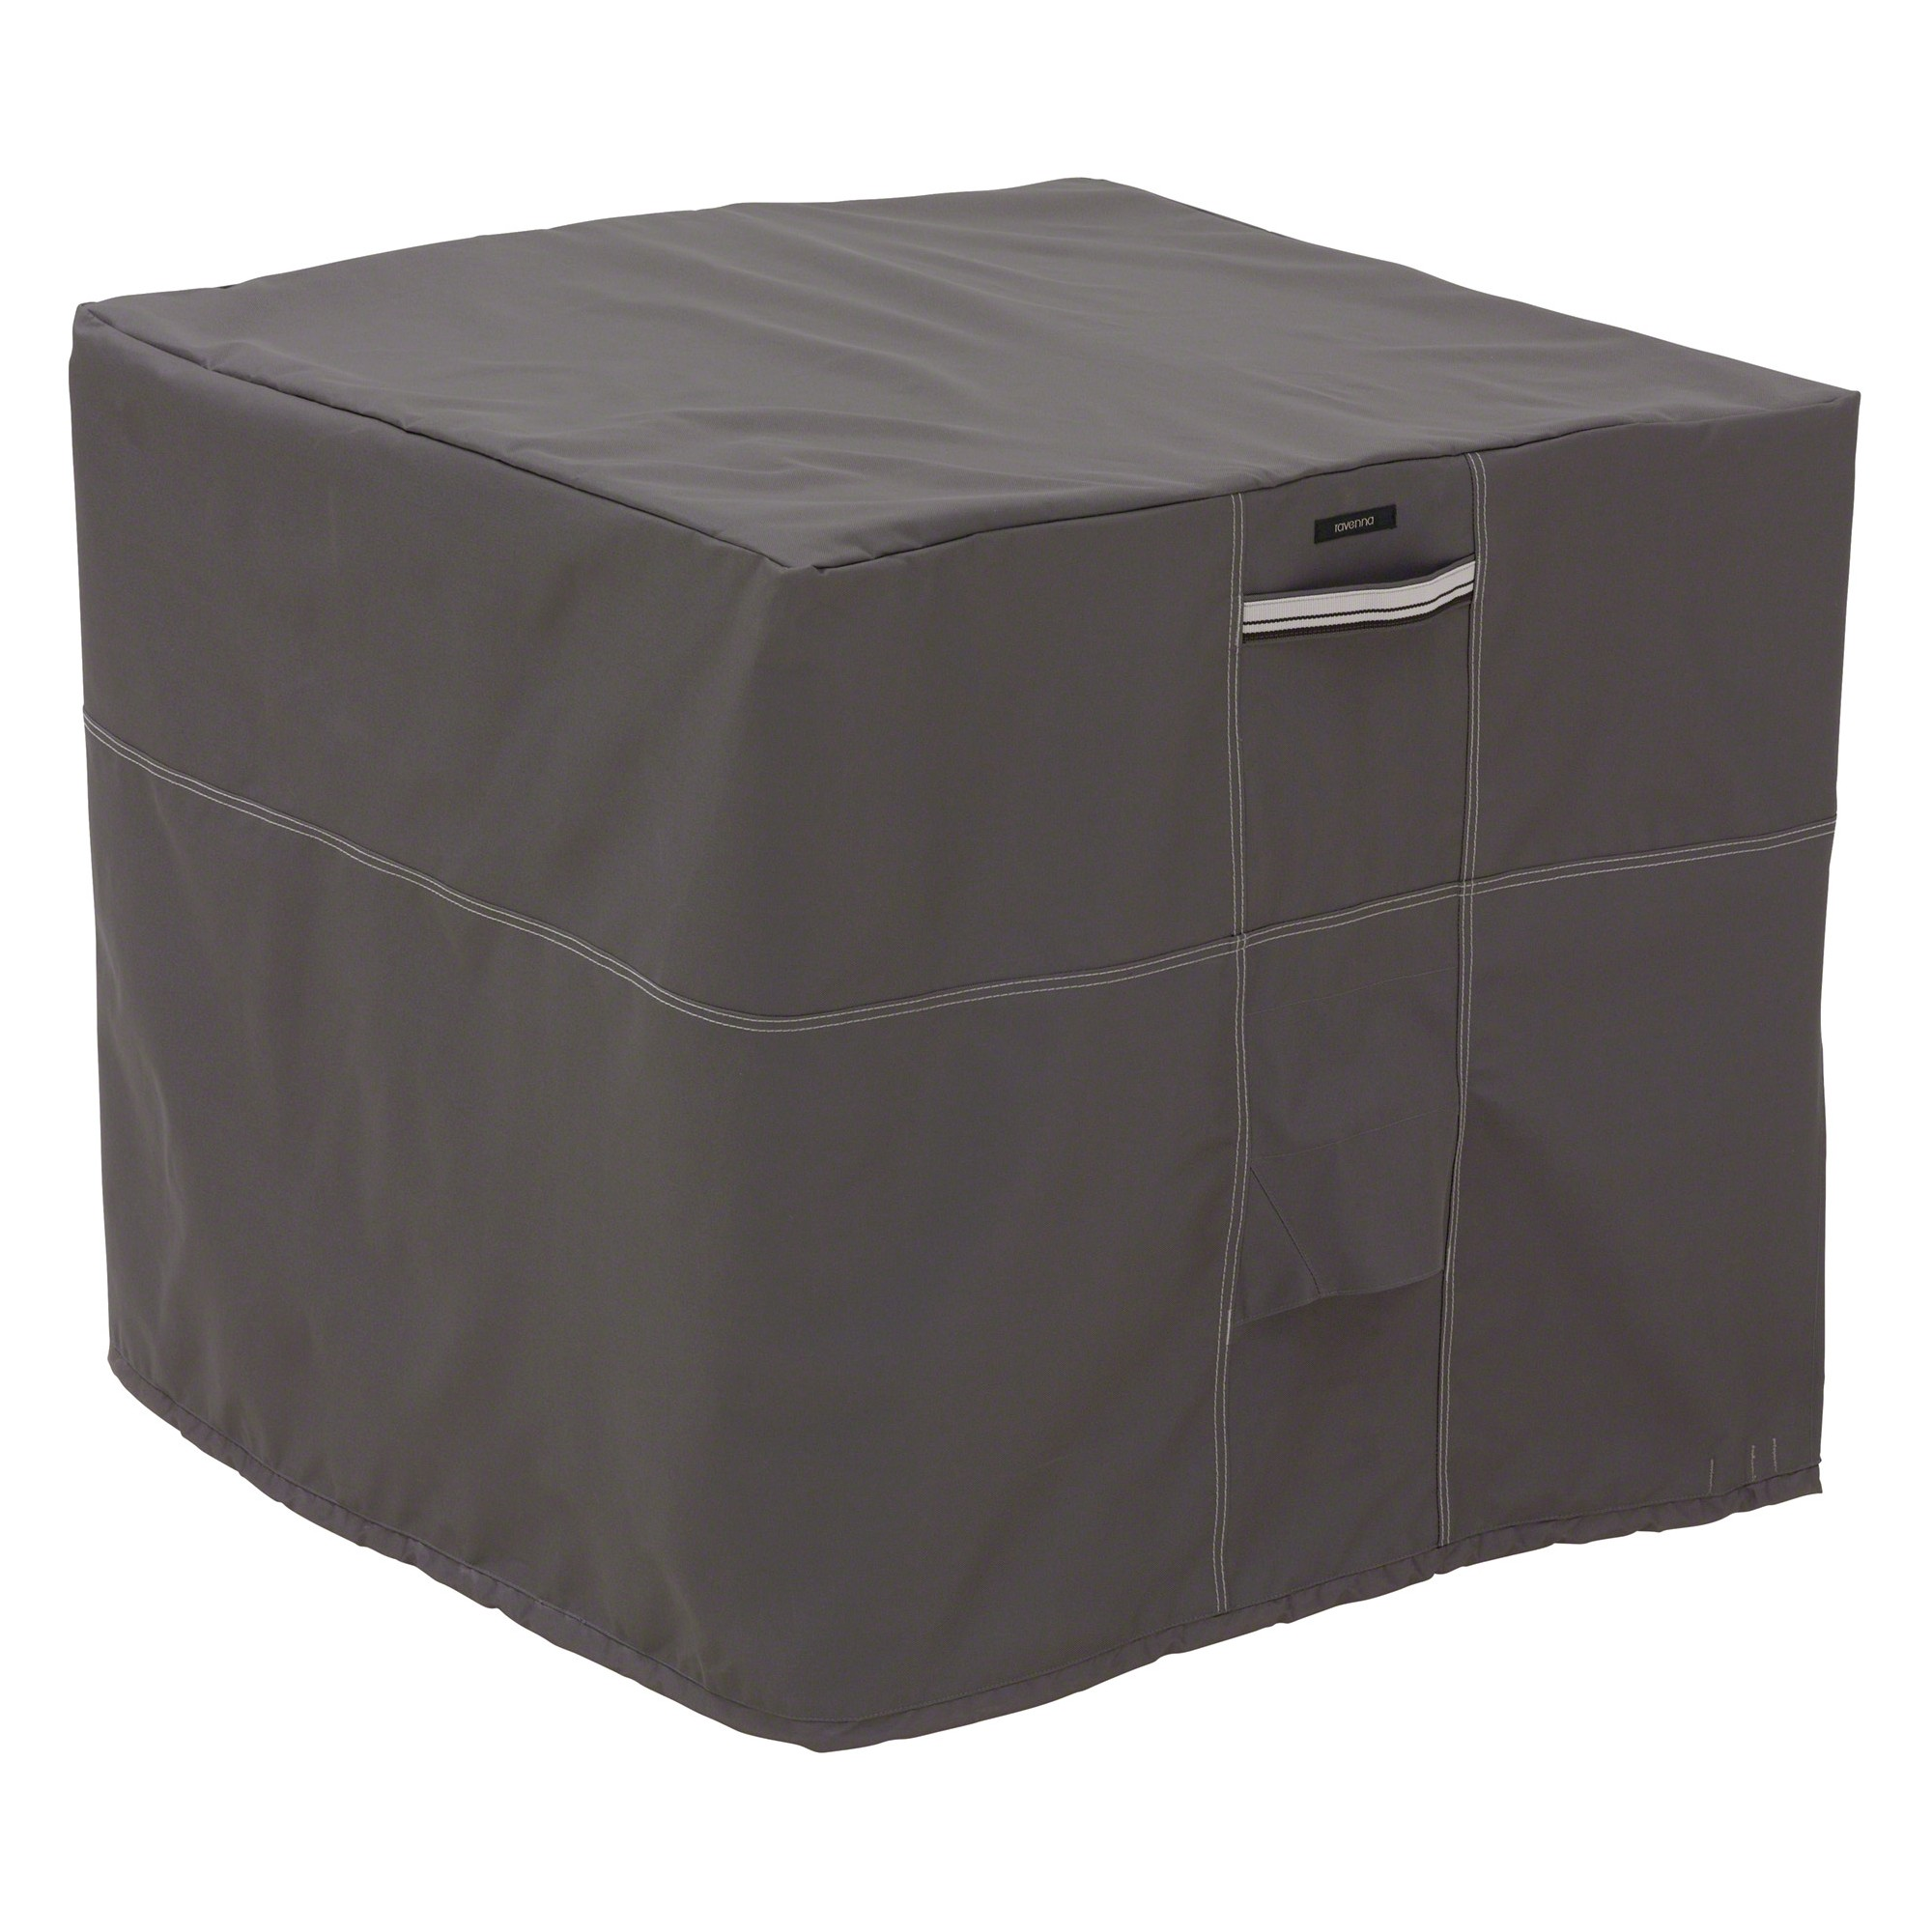 Ravenna Square Air Conditioner Cover Dark Taupe